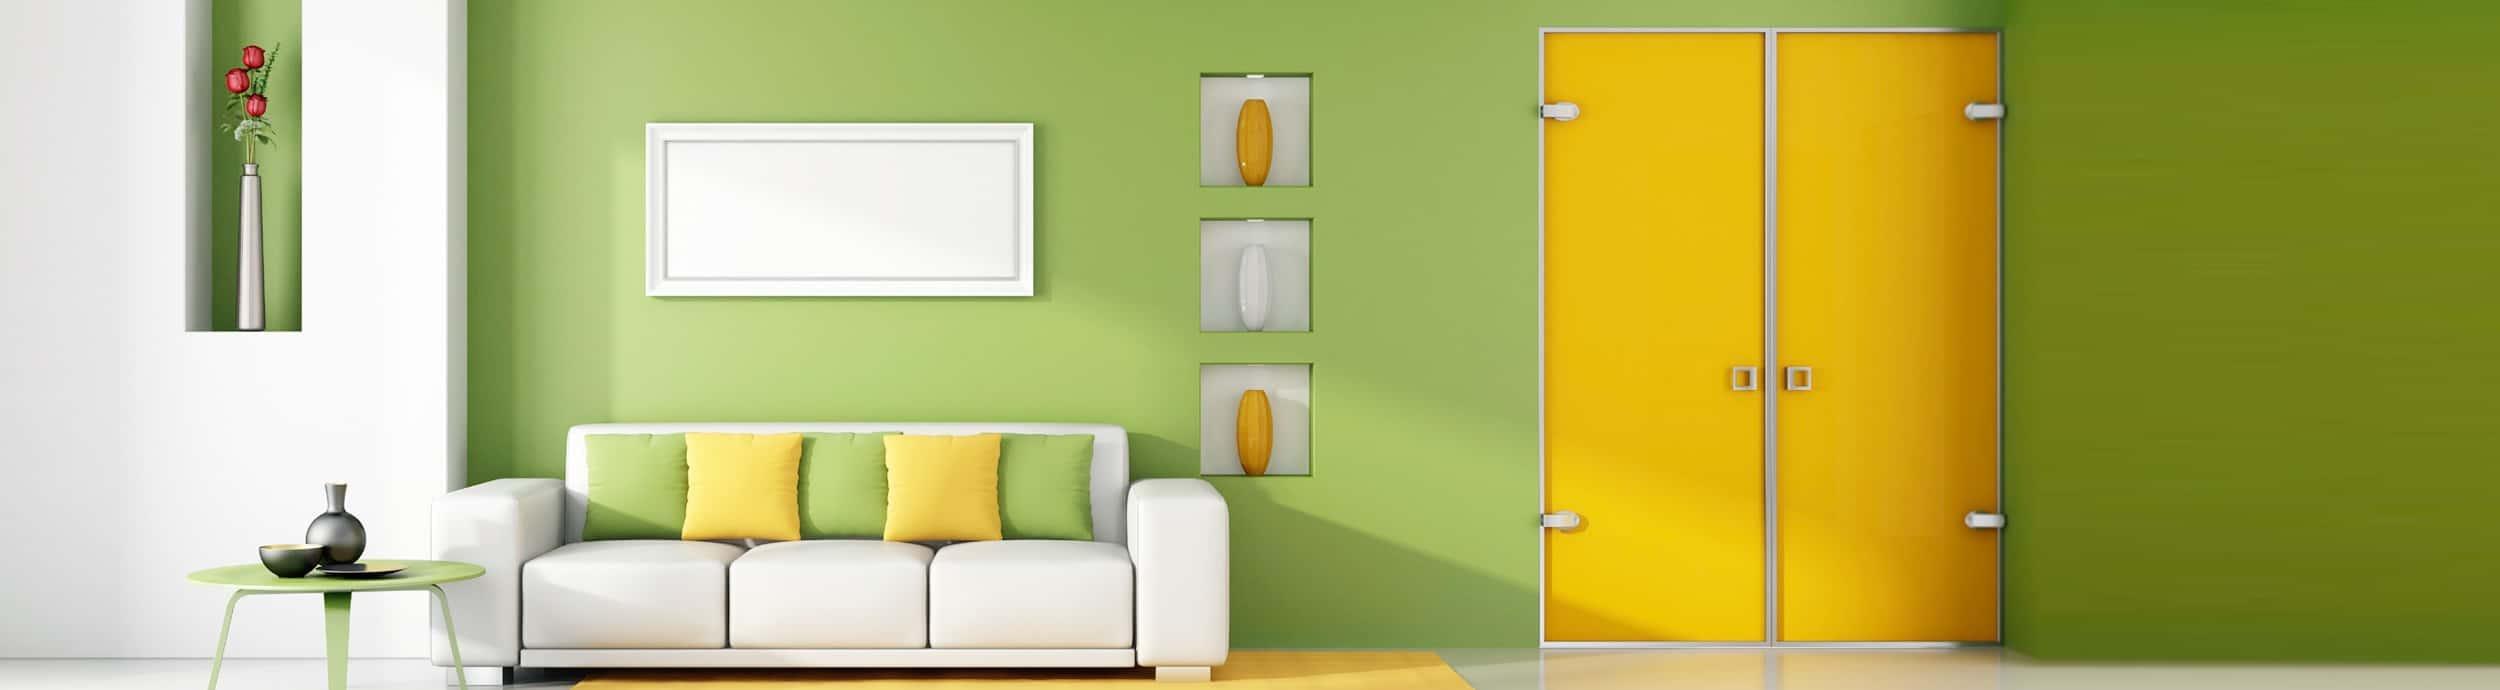 Luxol Satin Enamel Finish Paint for Interior & Exteriors – Berger Paints